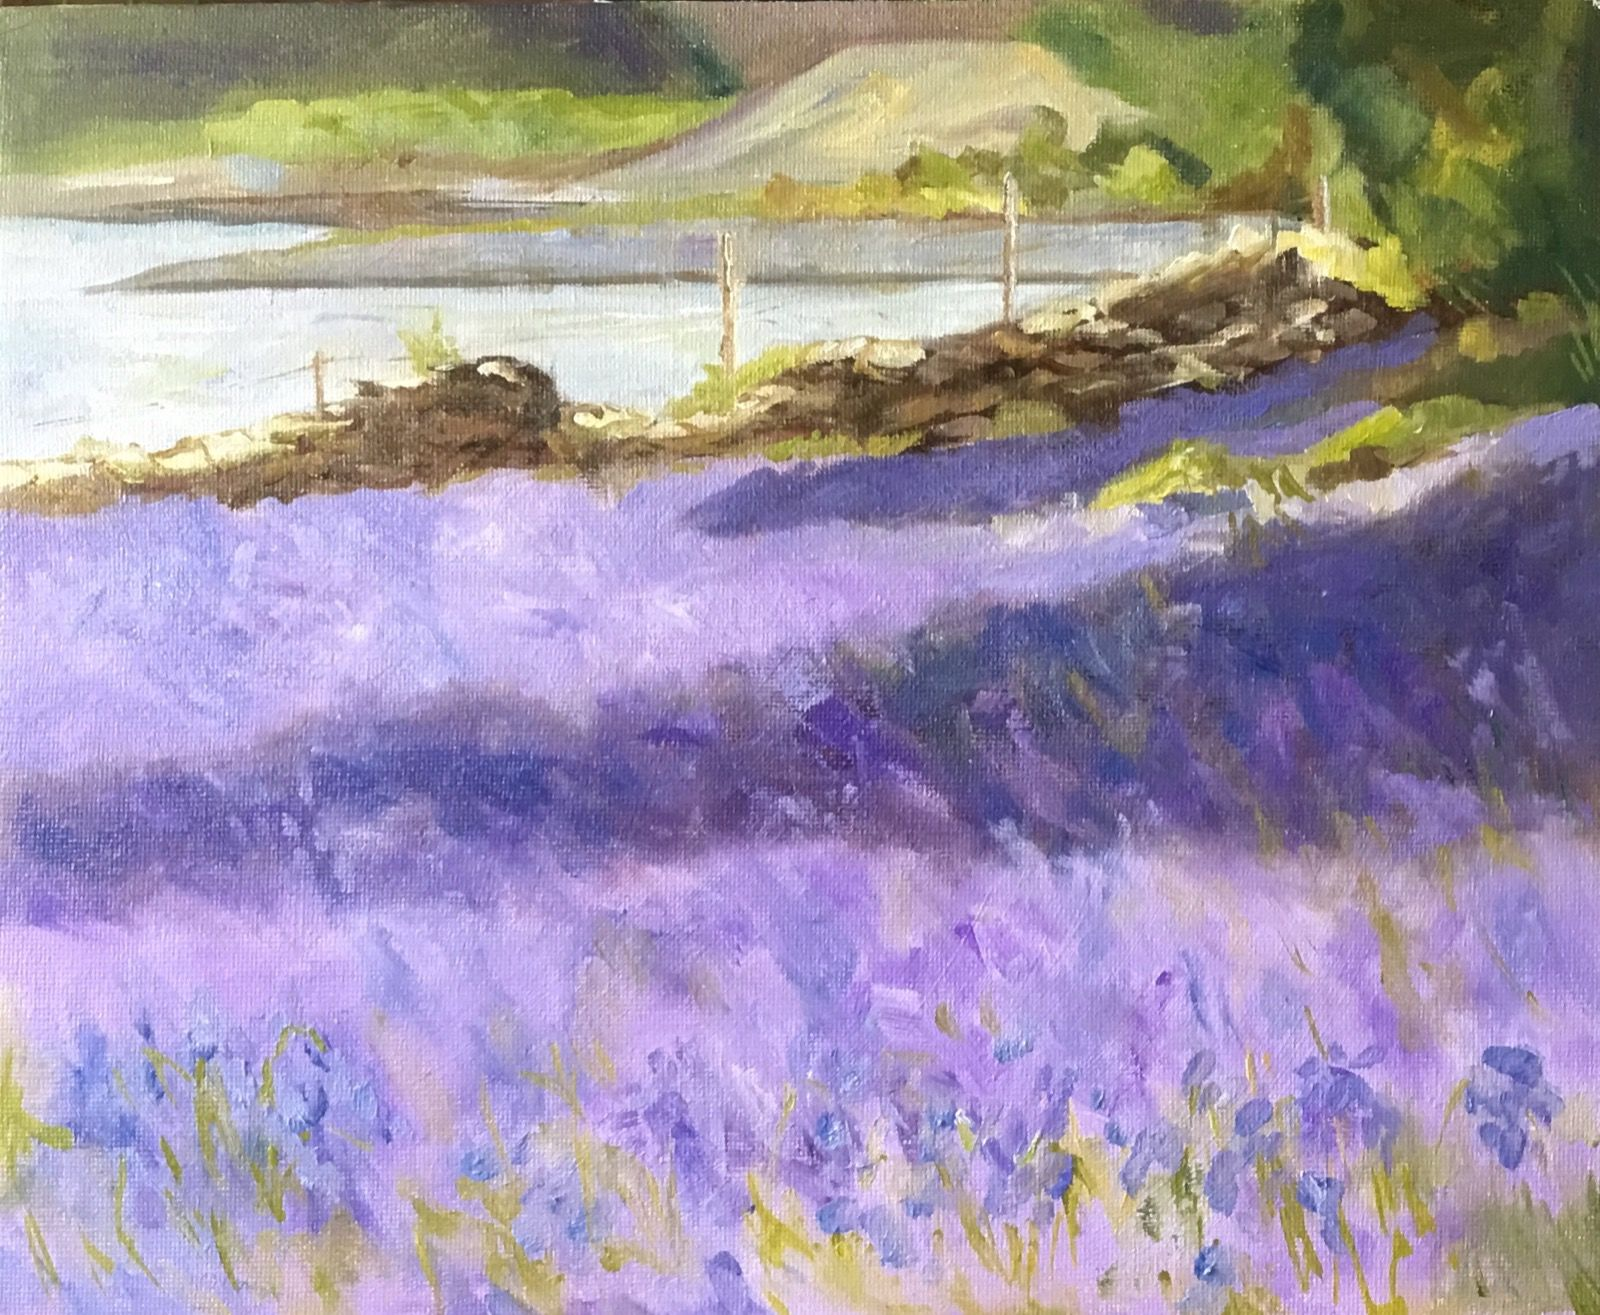 Bluebells, Loch Lomond.